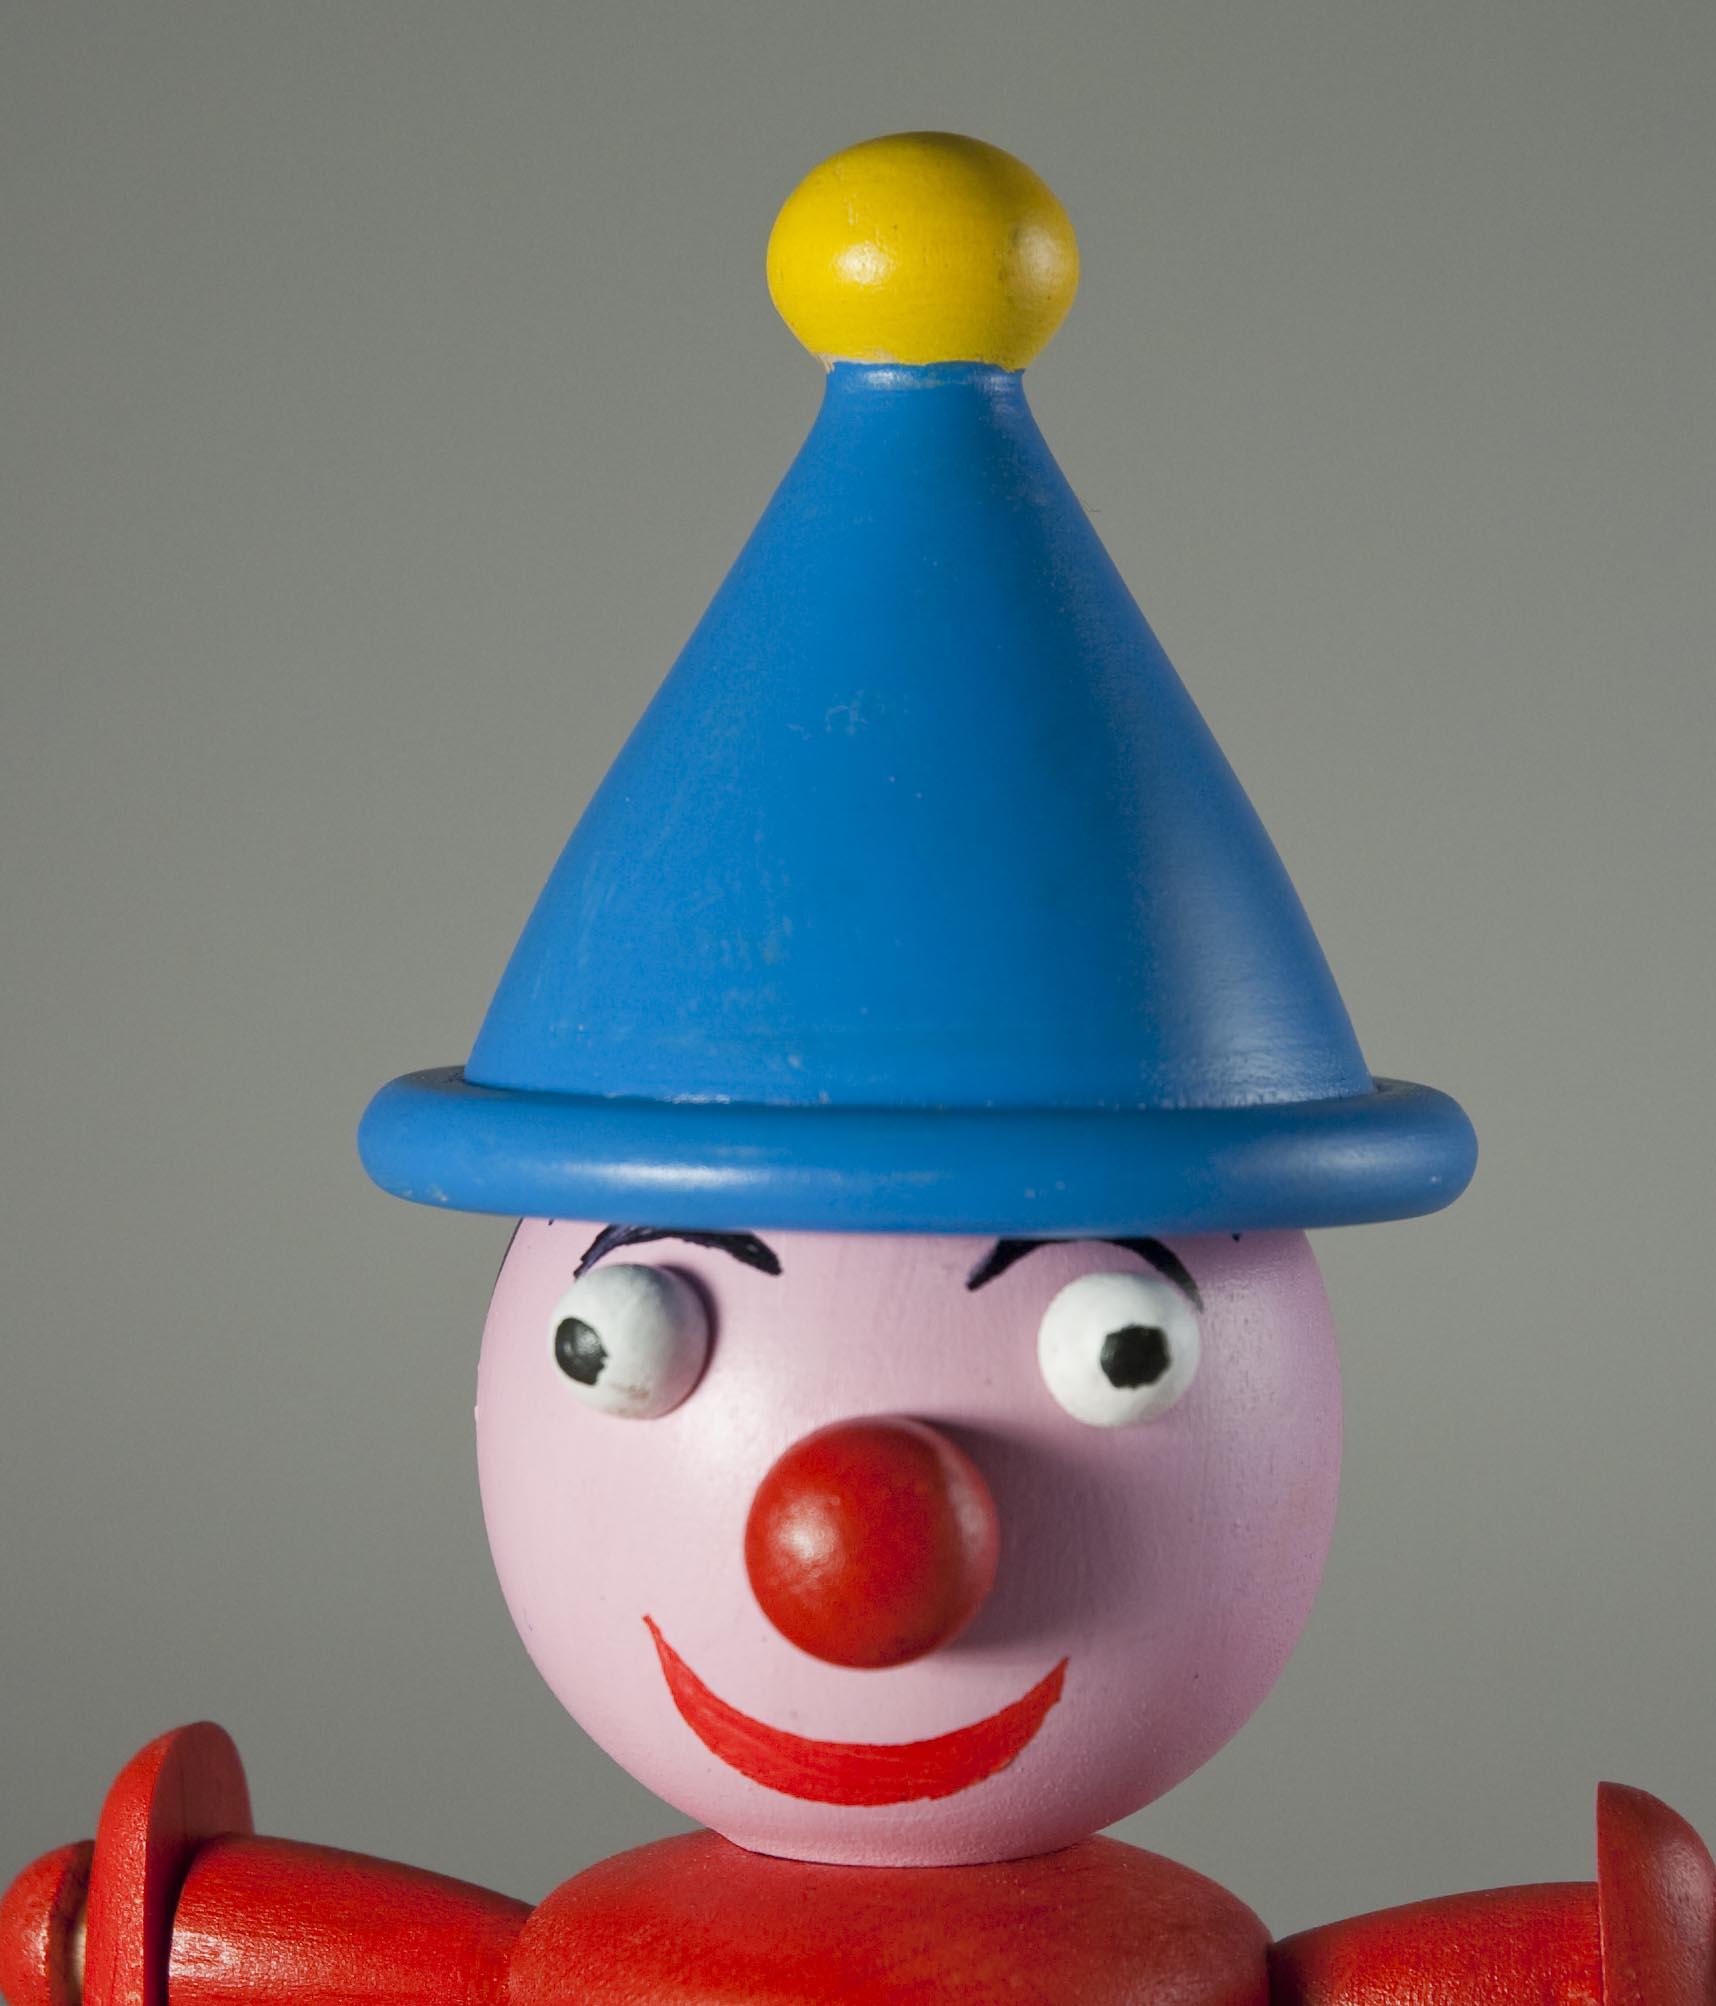 clownclose1.jpg